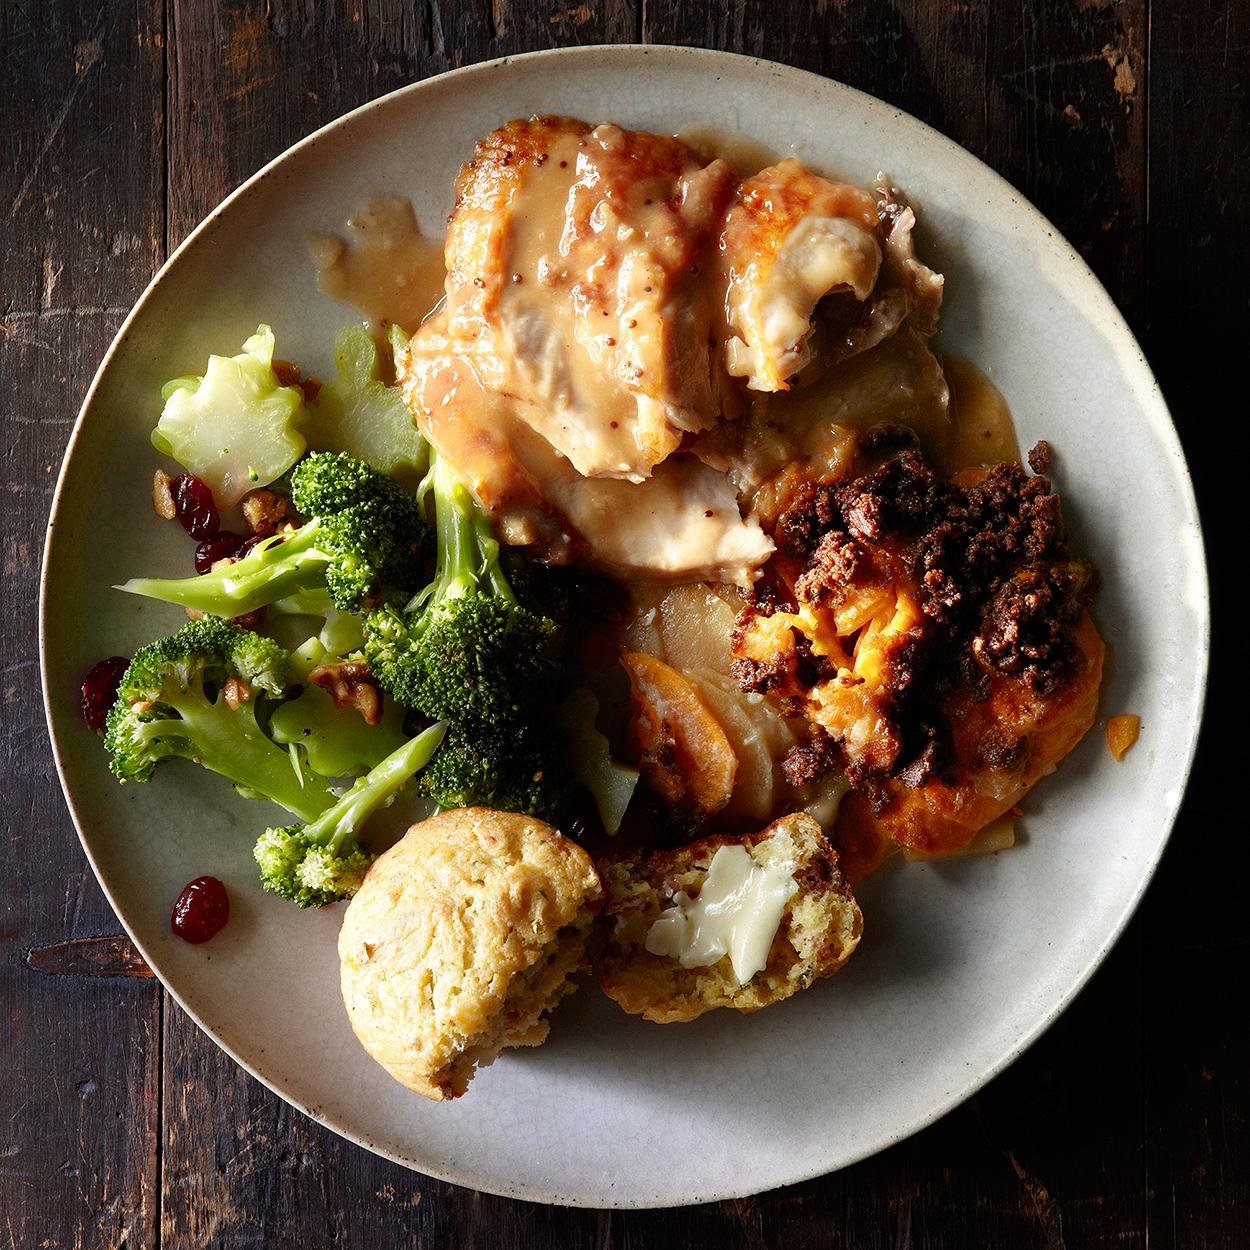 turkey, broccoli salad, sweet potatoes and muffin on plate